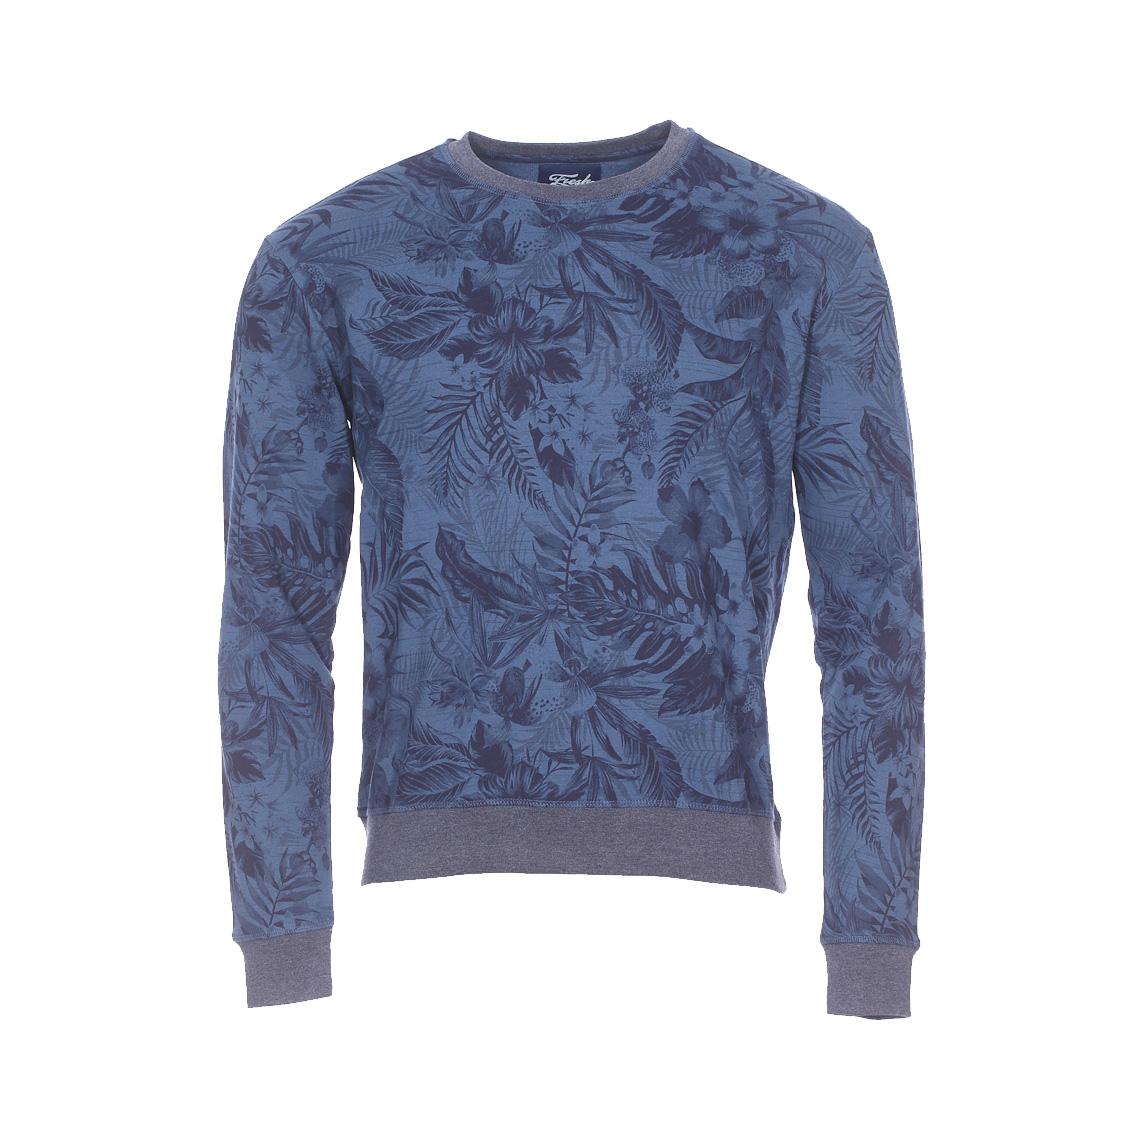 Sweat The Fresh Brand bleu indigo à fleurs bleu marine